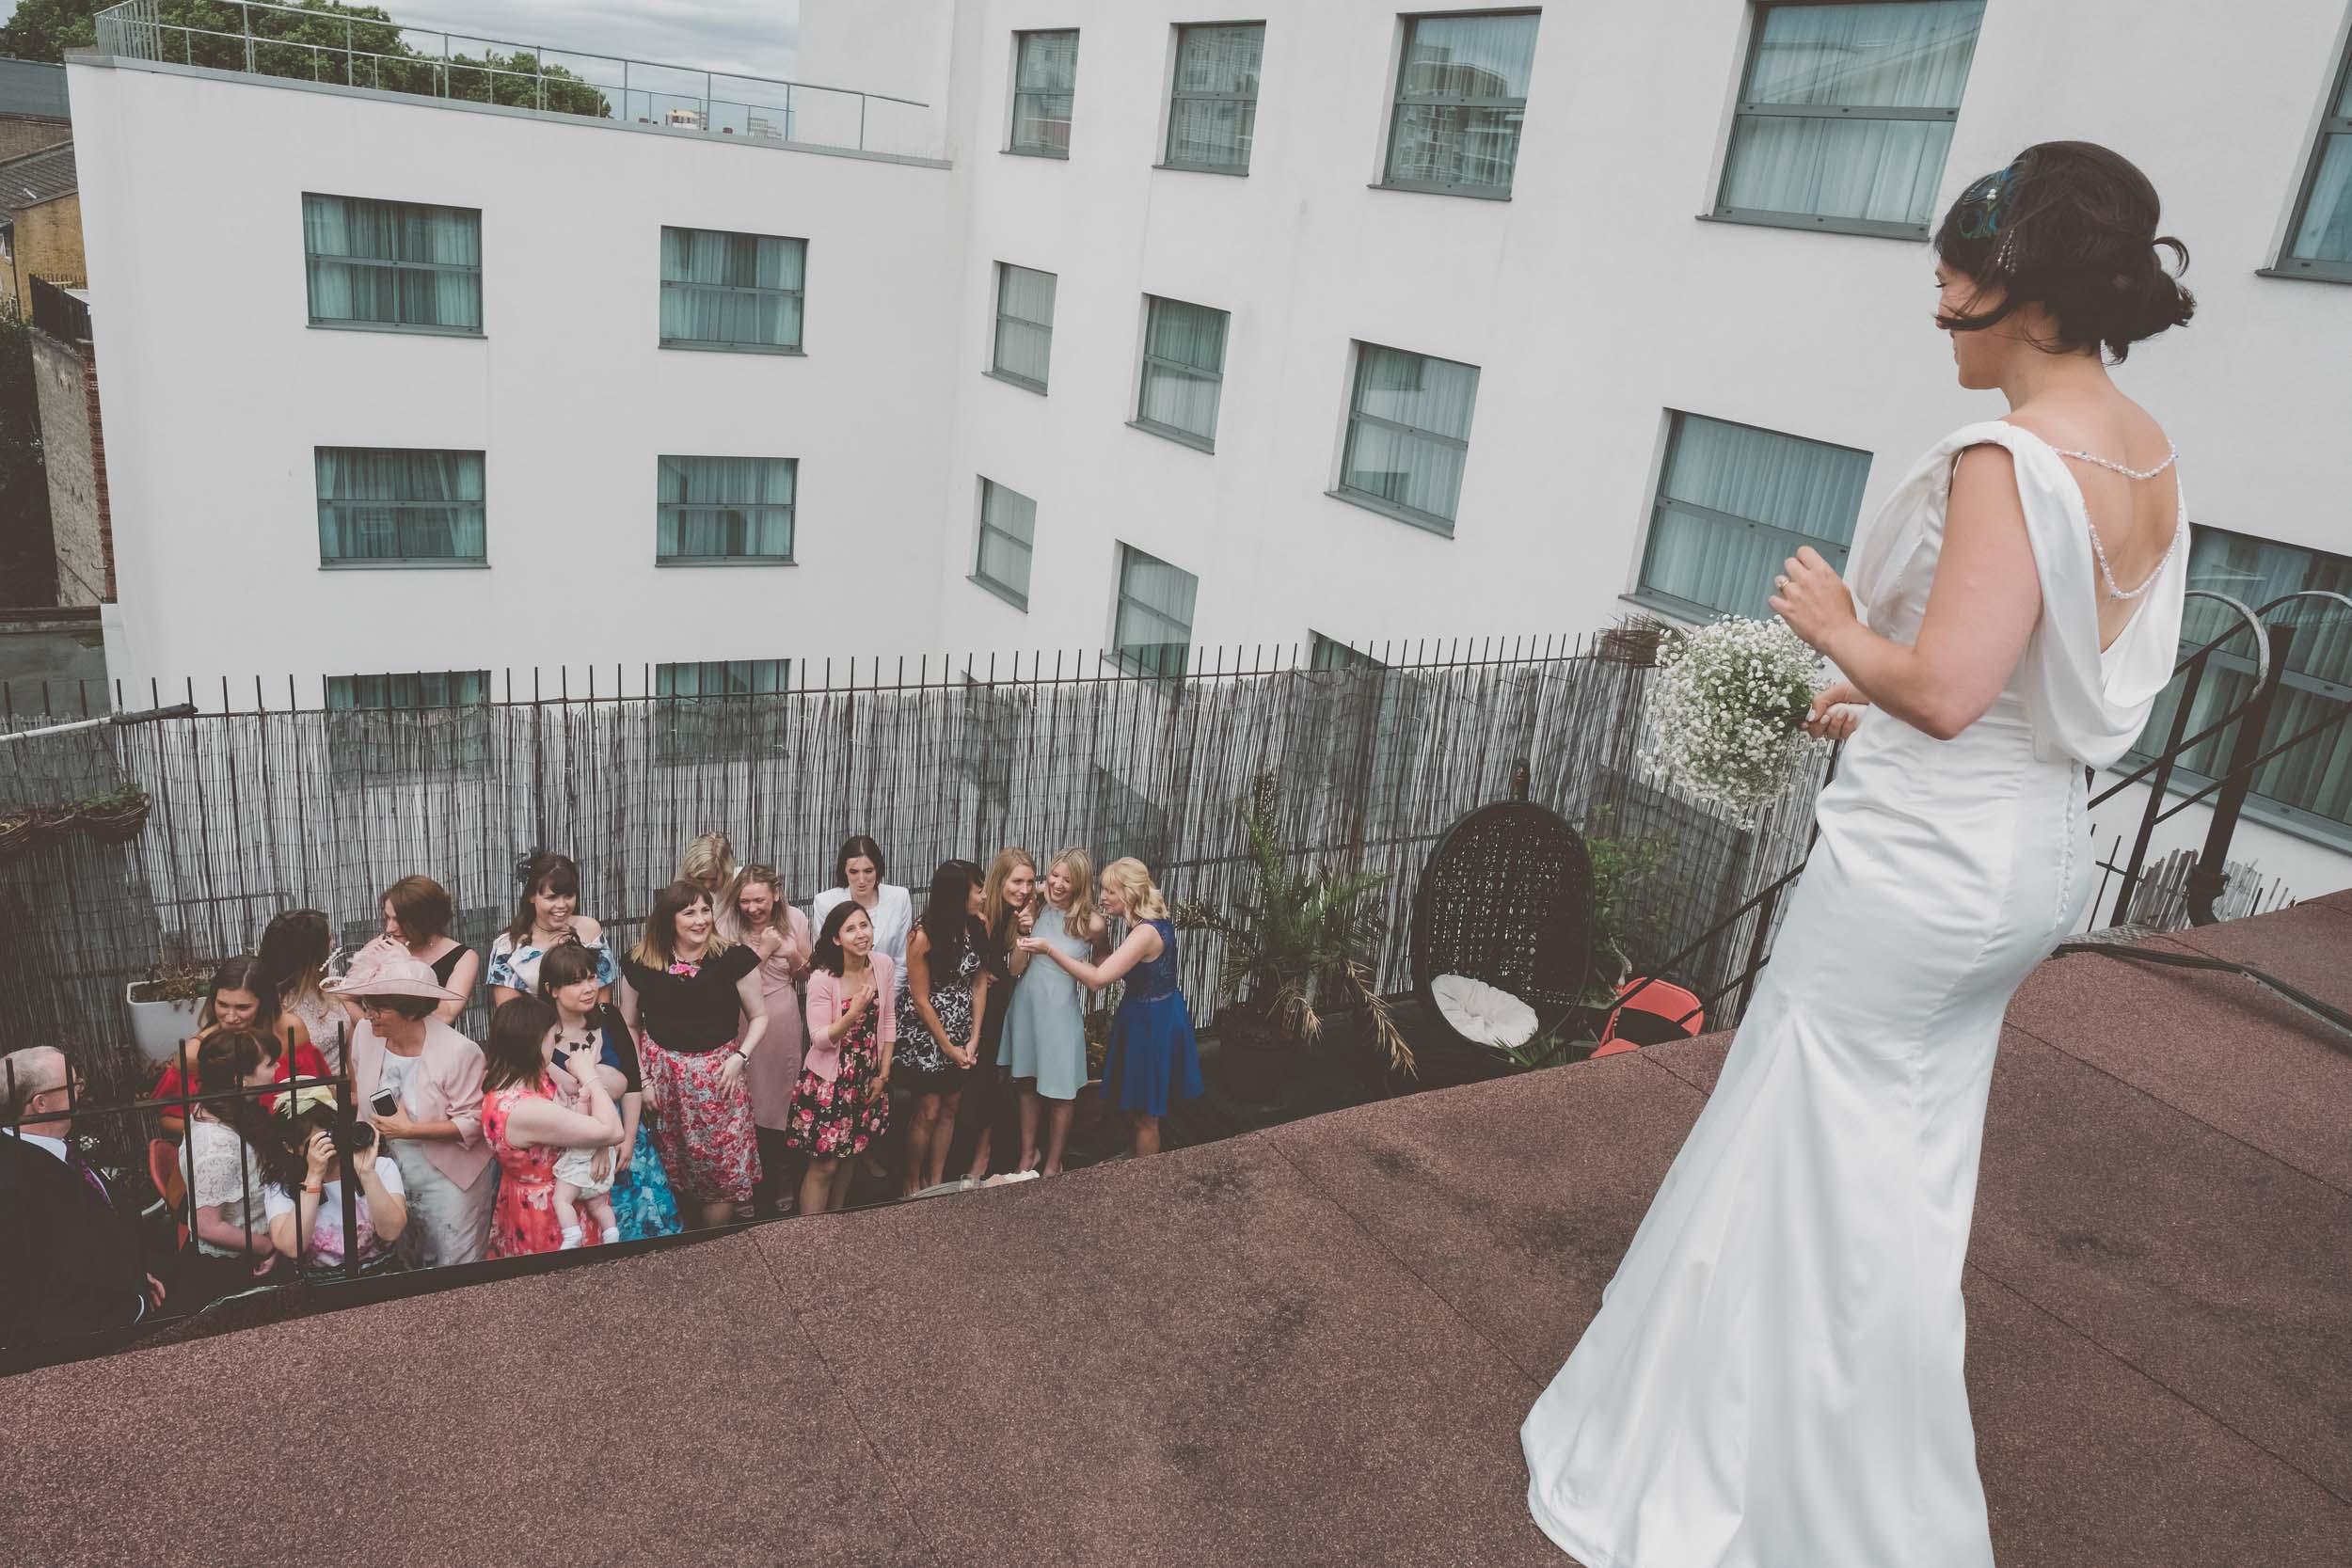 islington-town-hall-4th-floor-studios-wedding269.jpg